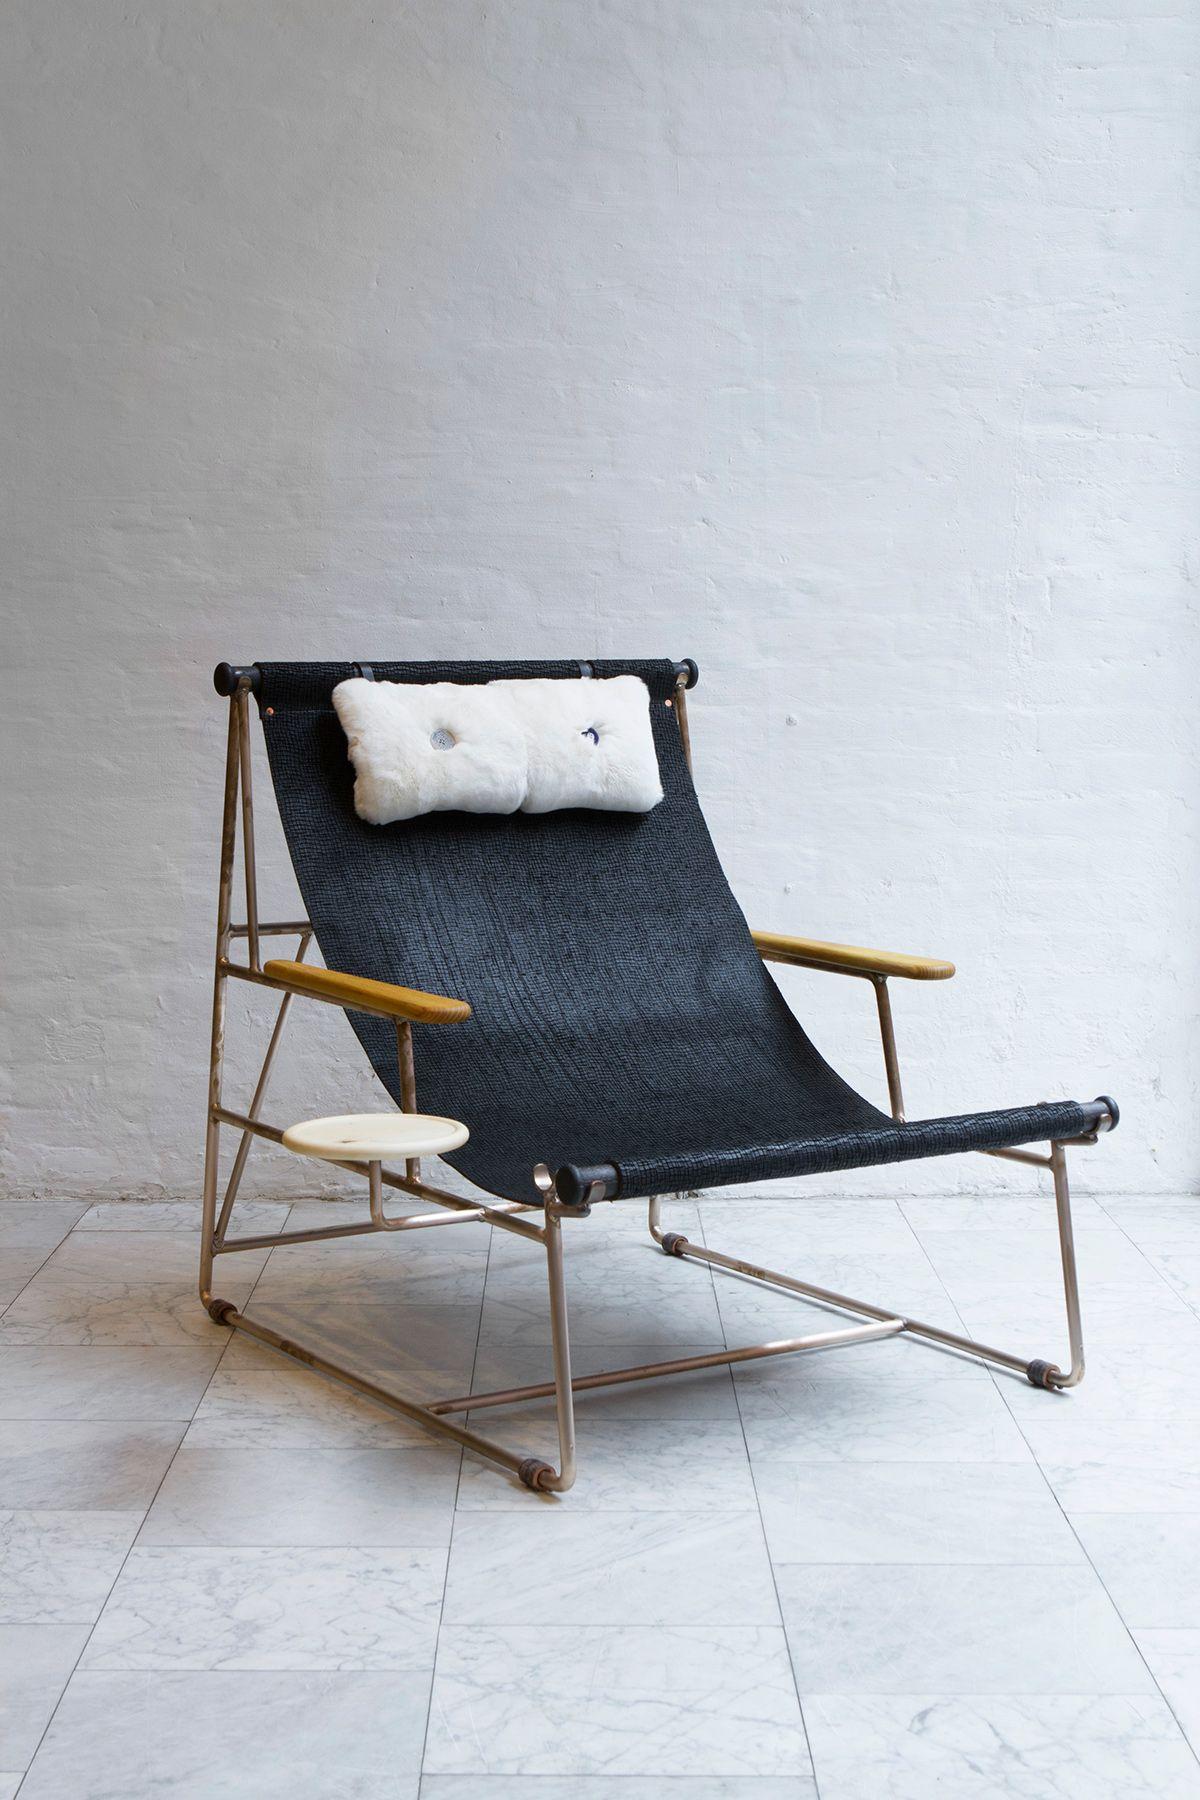 Furniture Deck Chair Bddw Metropolitan Penthouse